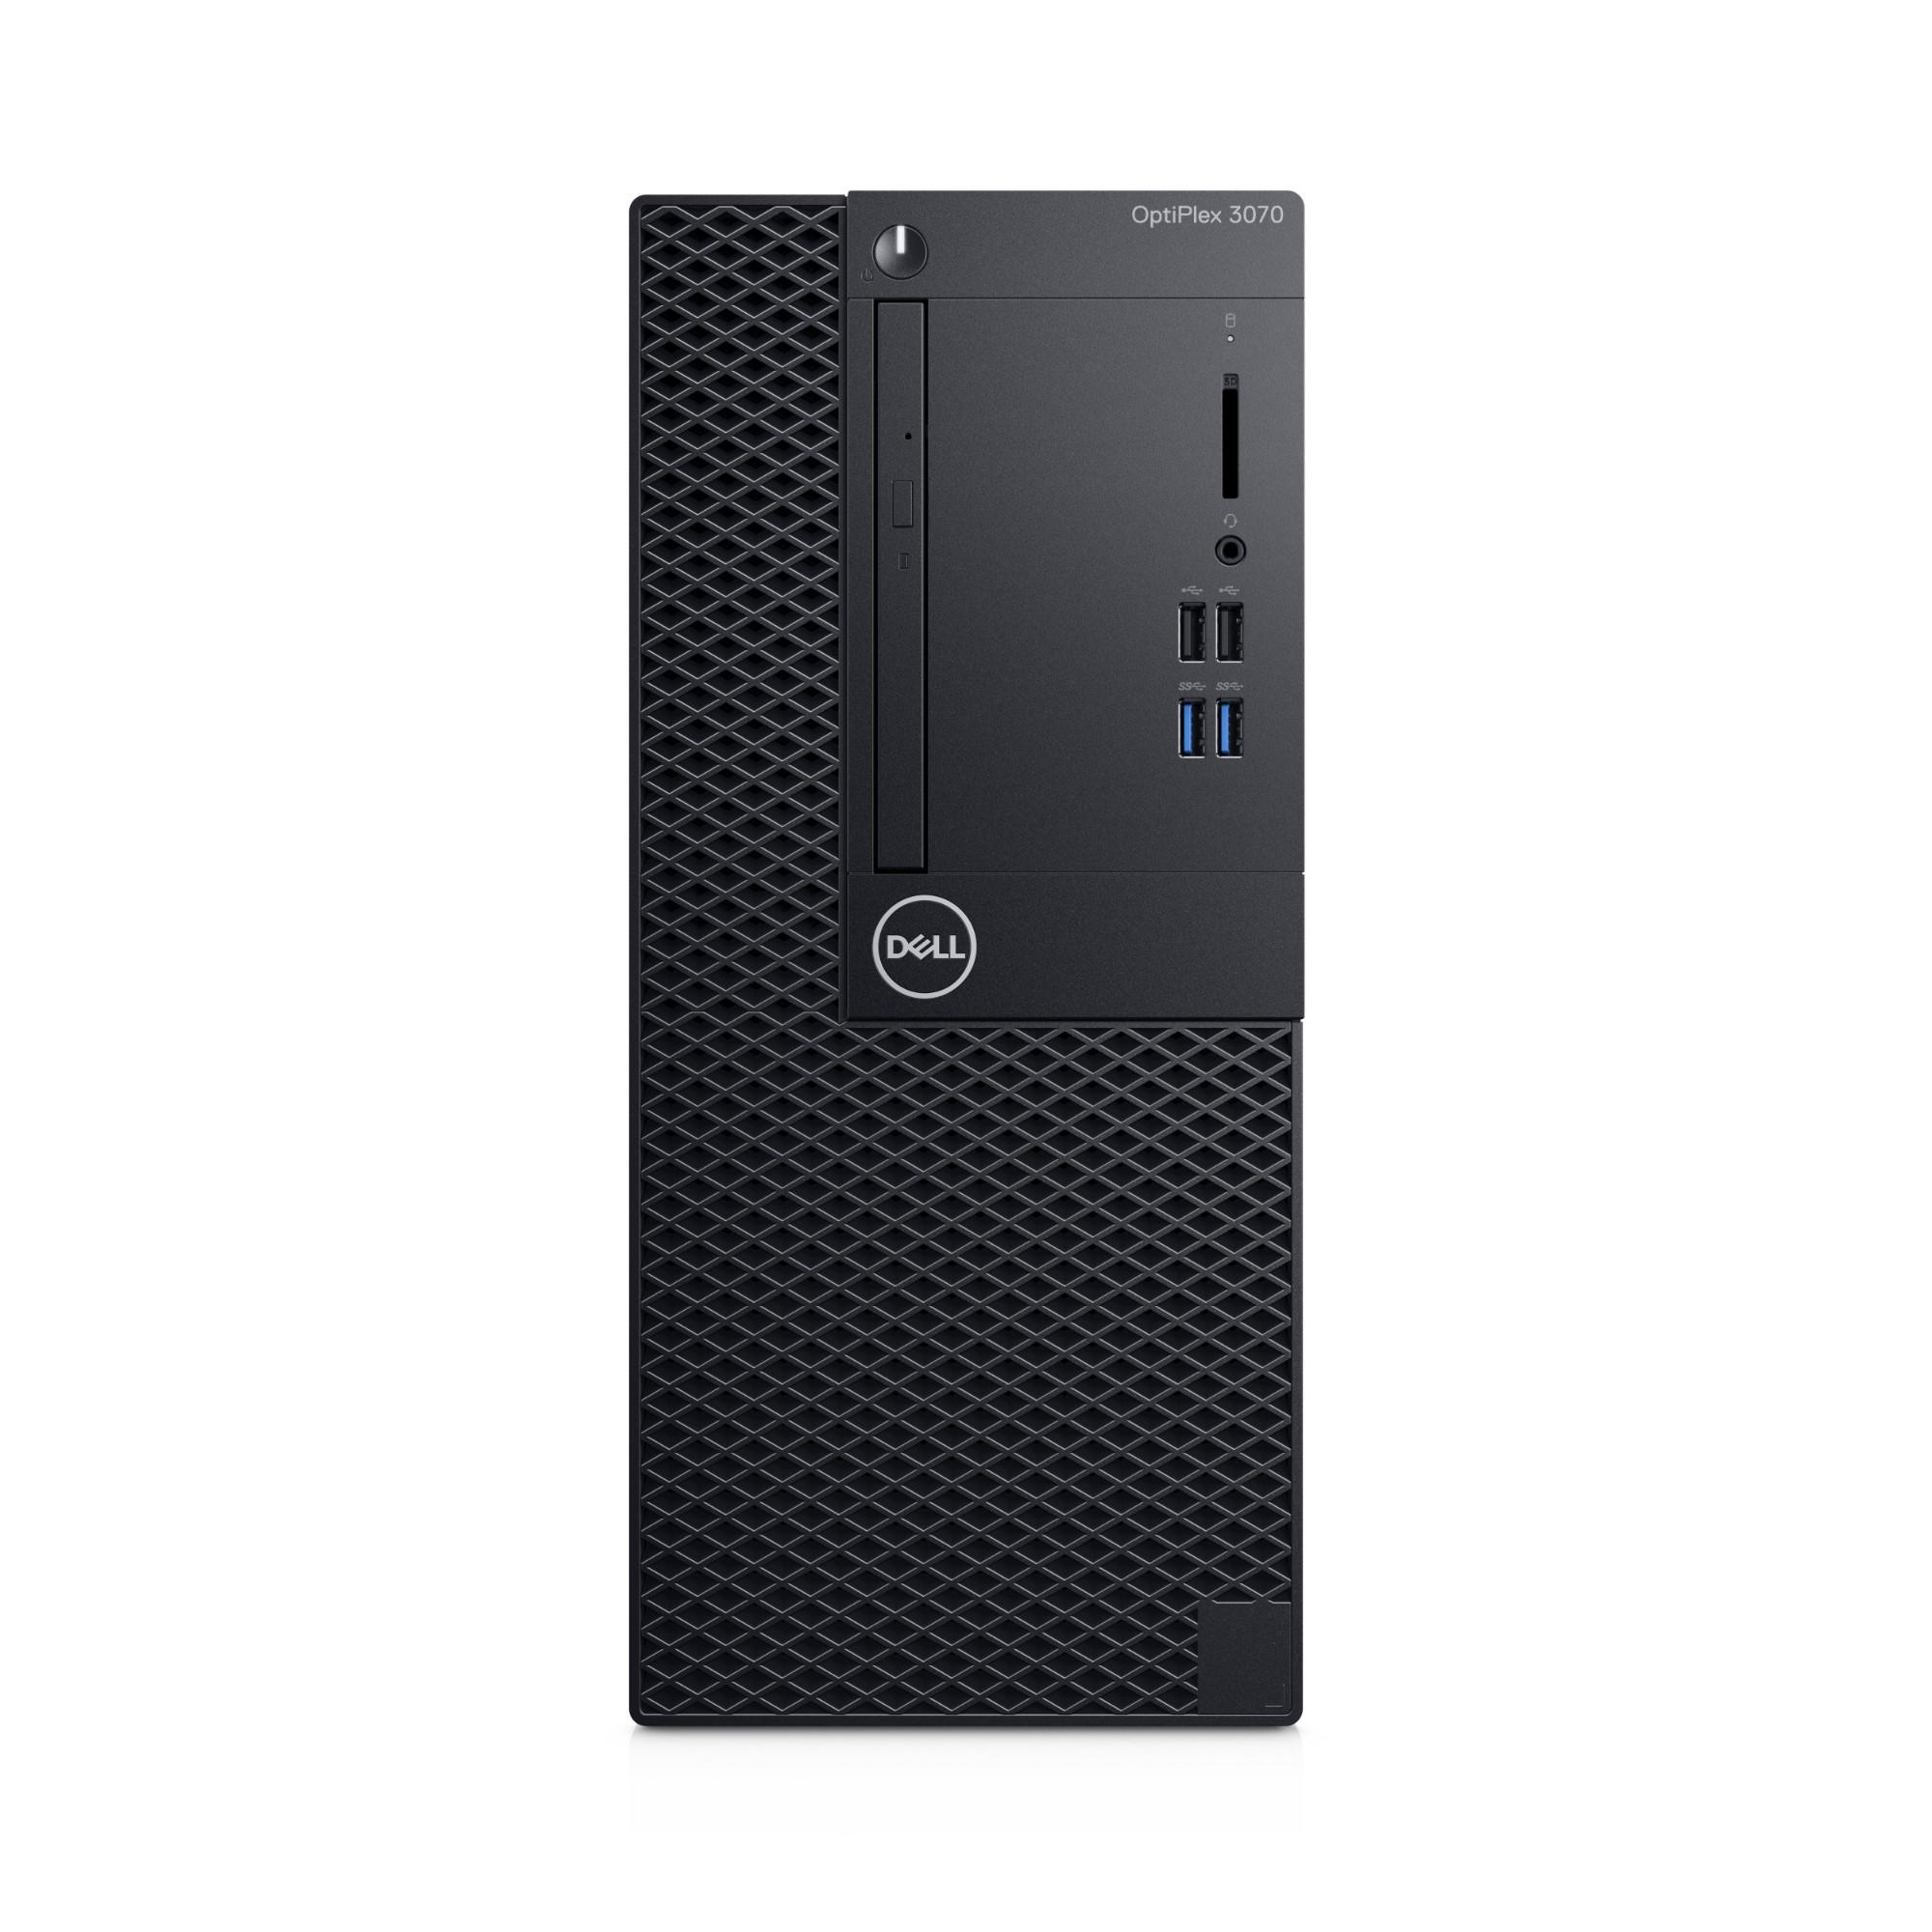 DELL OptiPlex 3070 9na generación de procesadores Intel® Core™ i5 i5-9500 8 GB DDR4-SDRAM 256 GB SSD Mini Tower Negro PC Windows 10 Pro